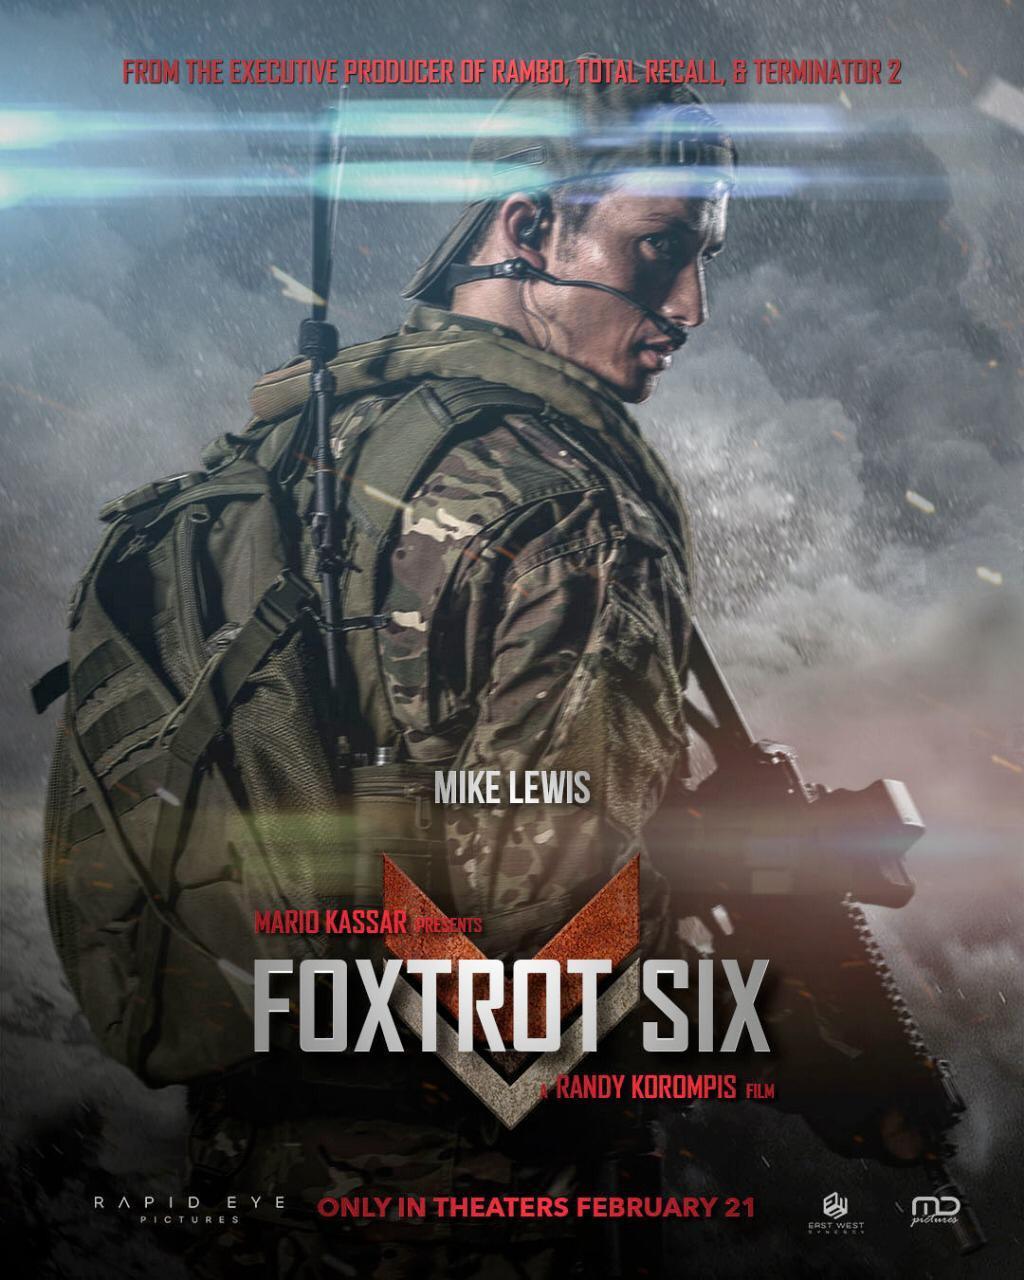 Mike Lewis, Foxtrot Six